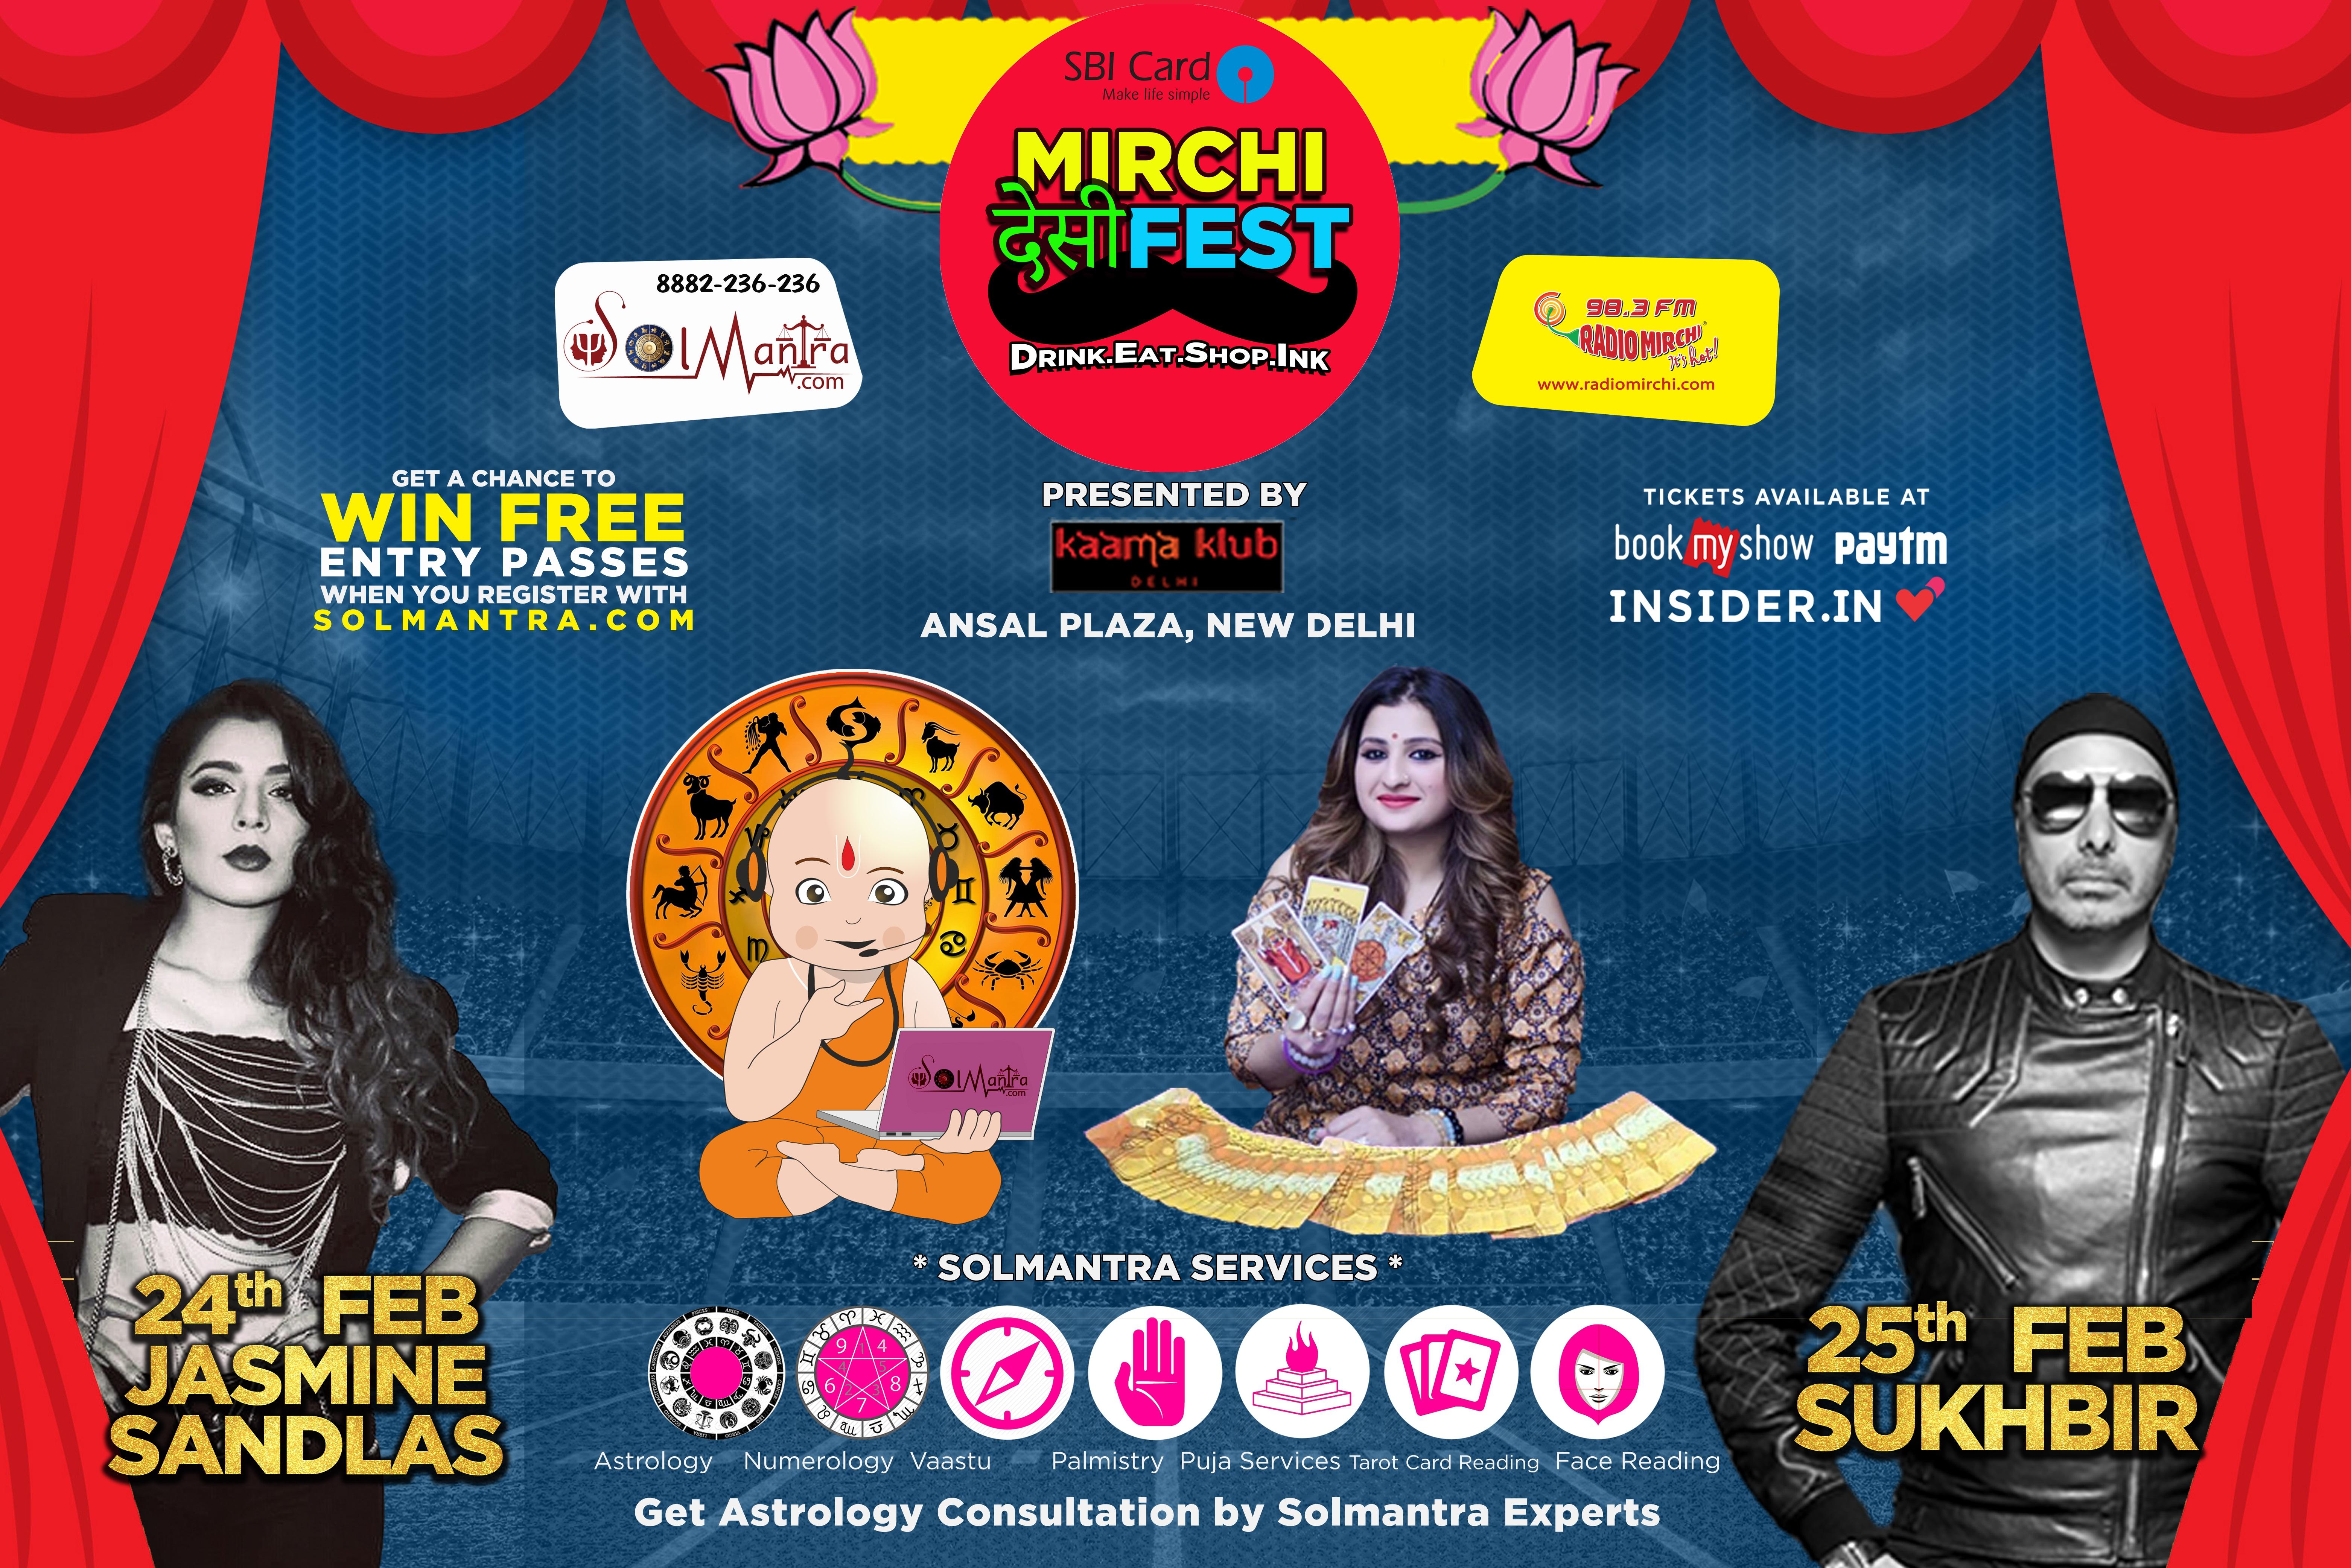 SBI Card Mirchi Desi Fest